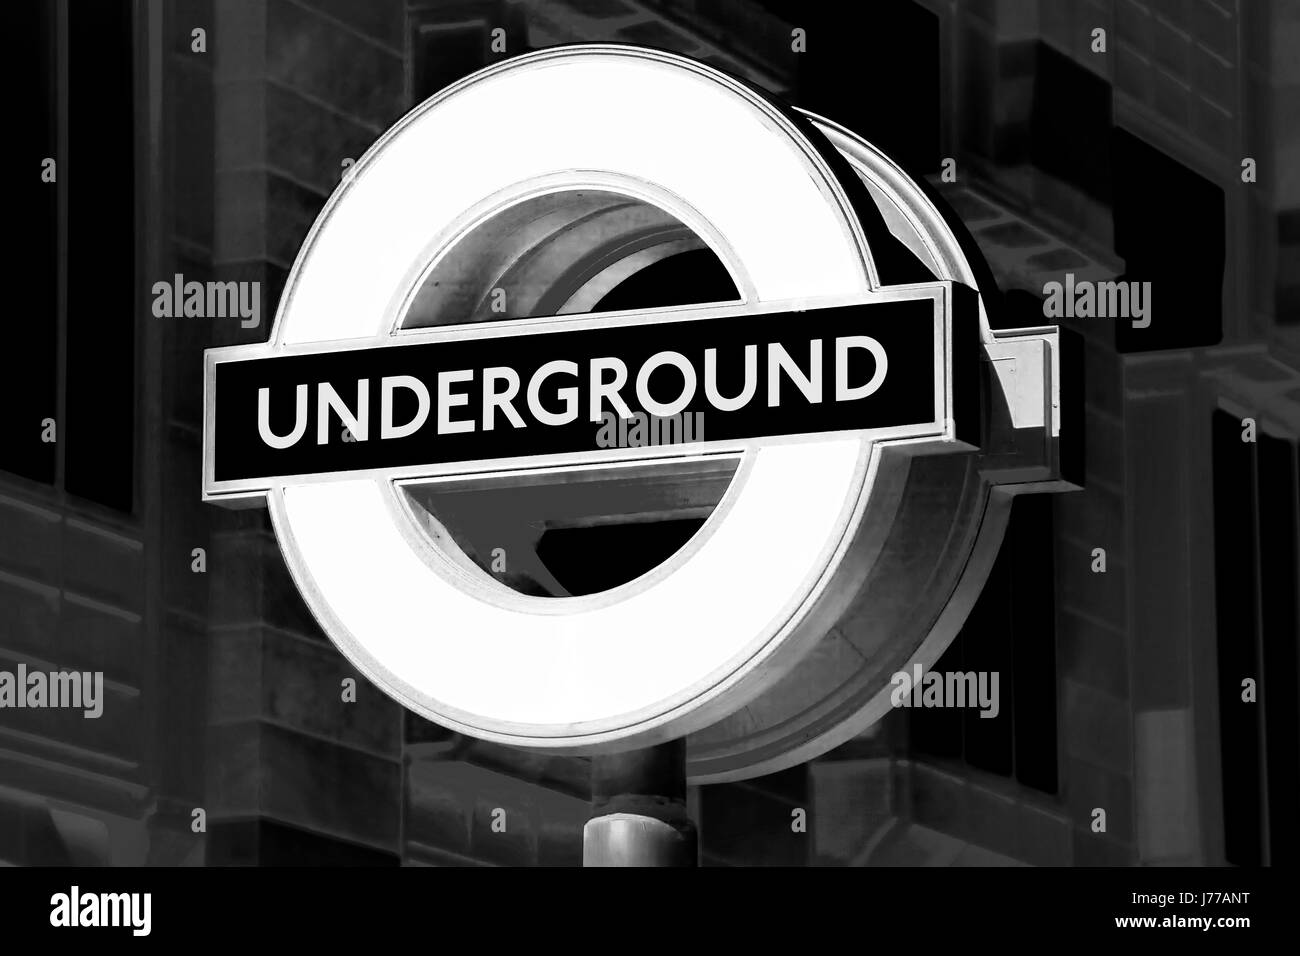 station travel london england tube subway sign underground pipe metro city town - Stock Image